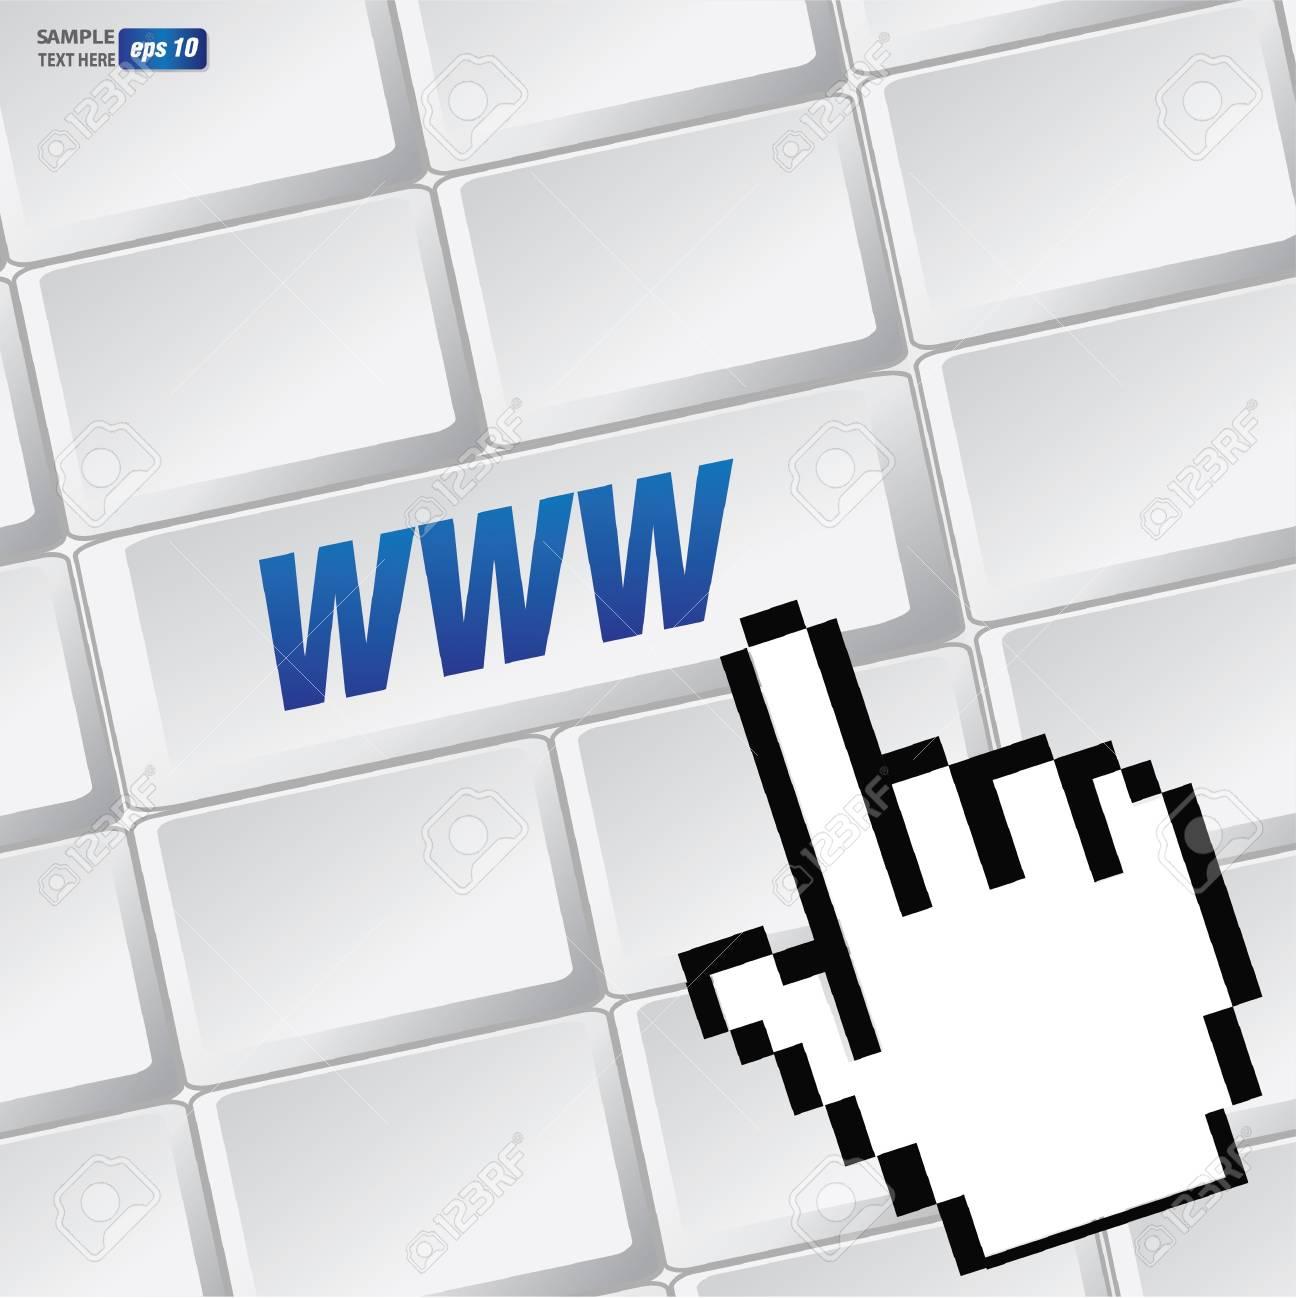 WWW symbol on keyboard,vector Stock Vector - 18616866